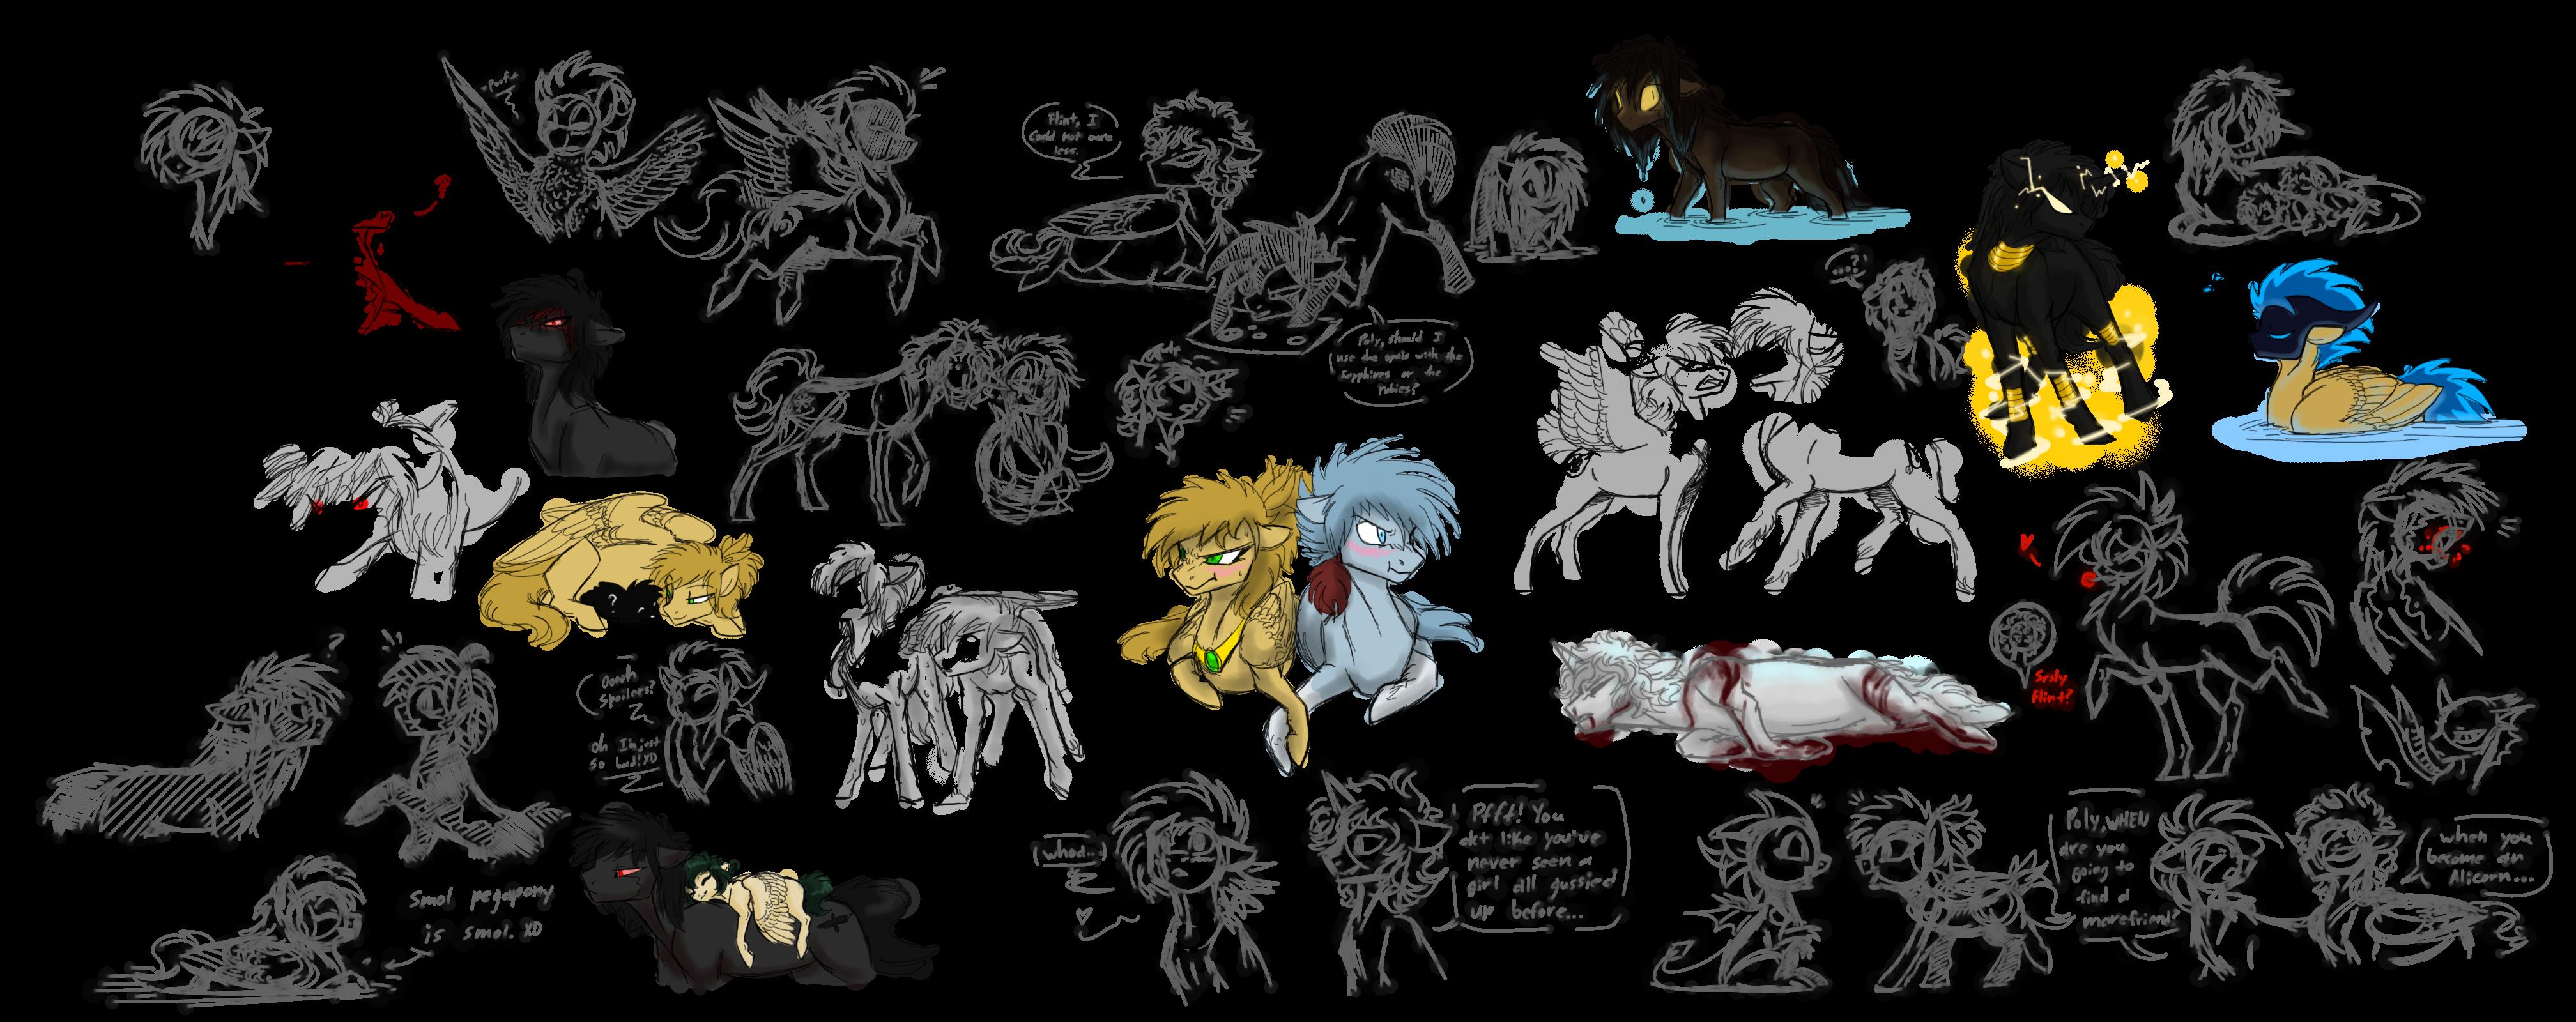 Pony Sketchies 2 by CoffeeAddictedDragon